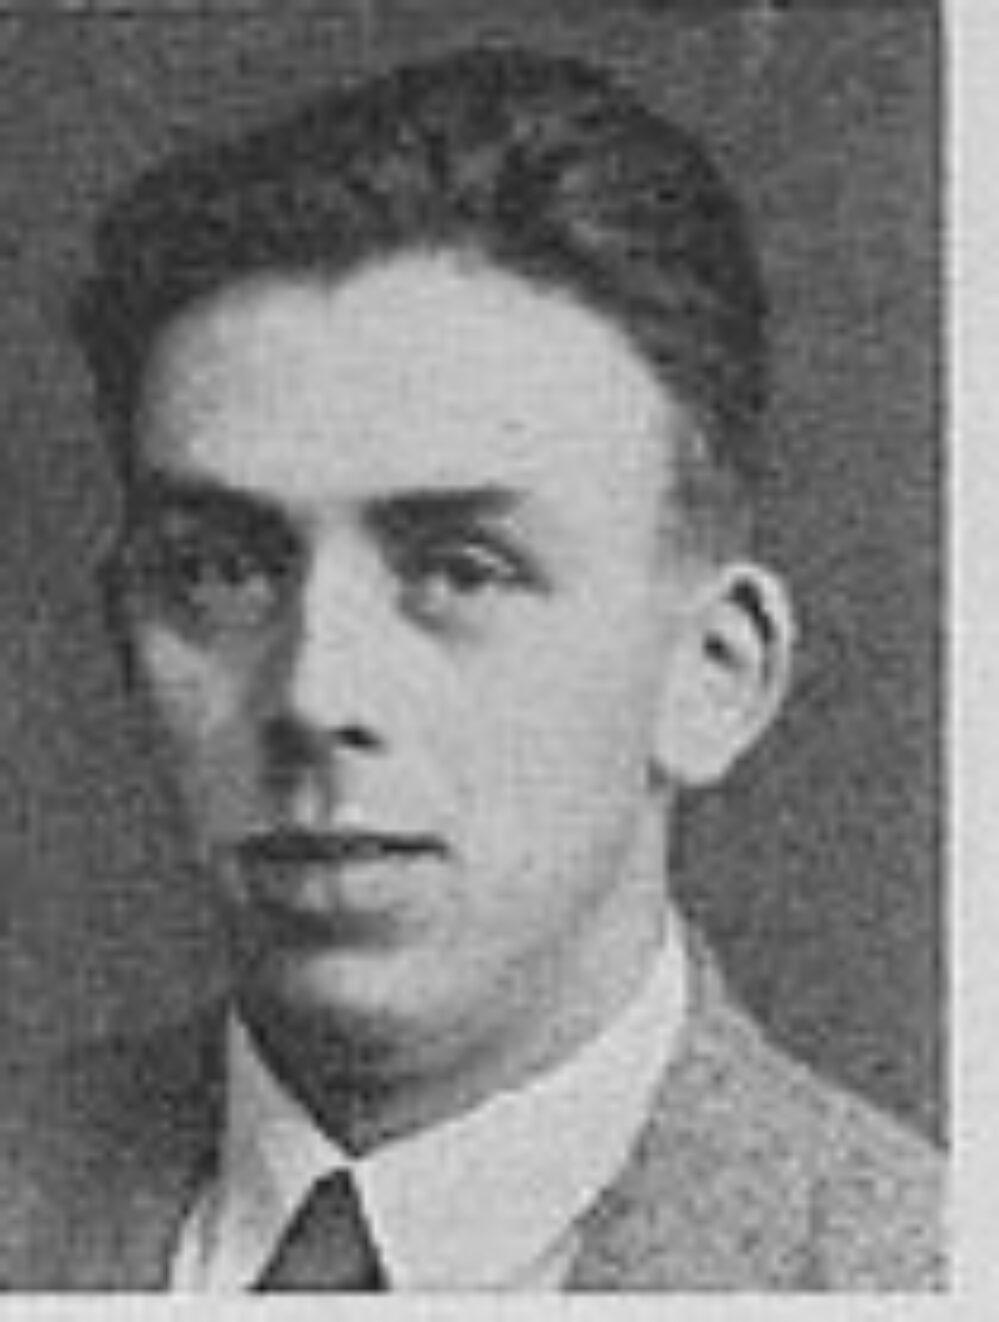 John William Flaaten